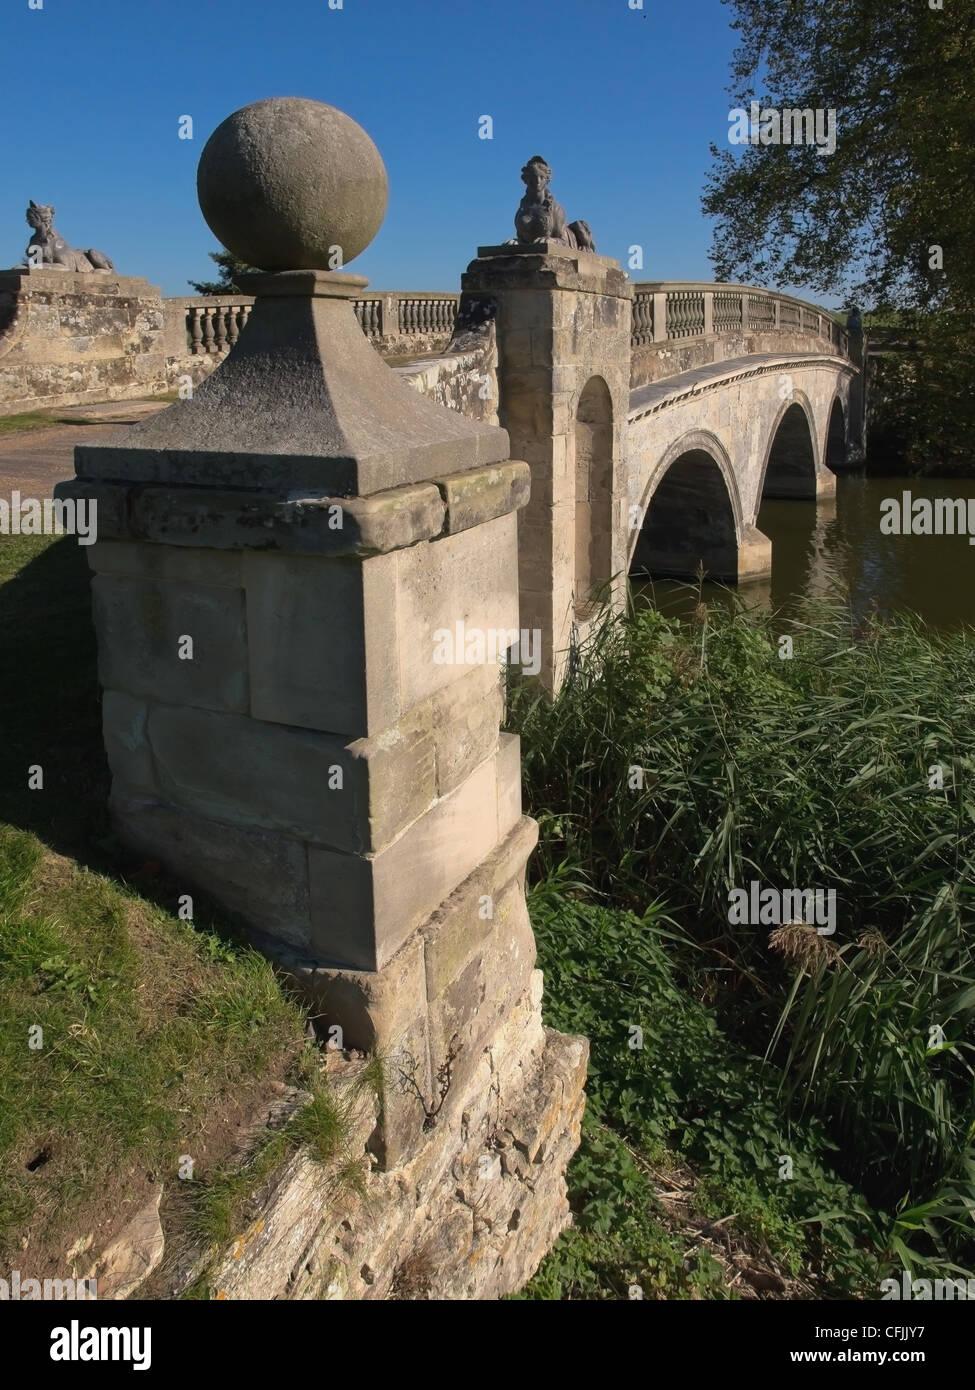 Robert Adam bridge, Compton Verney estate, Warwickshire, England, United Kingdom, Europe - Stock Image